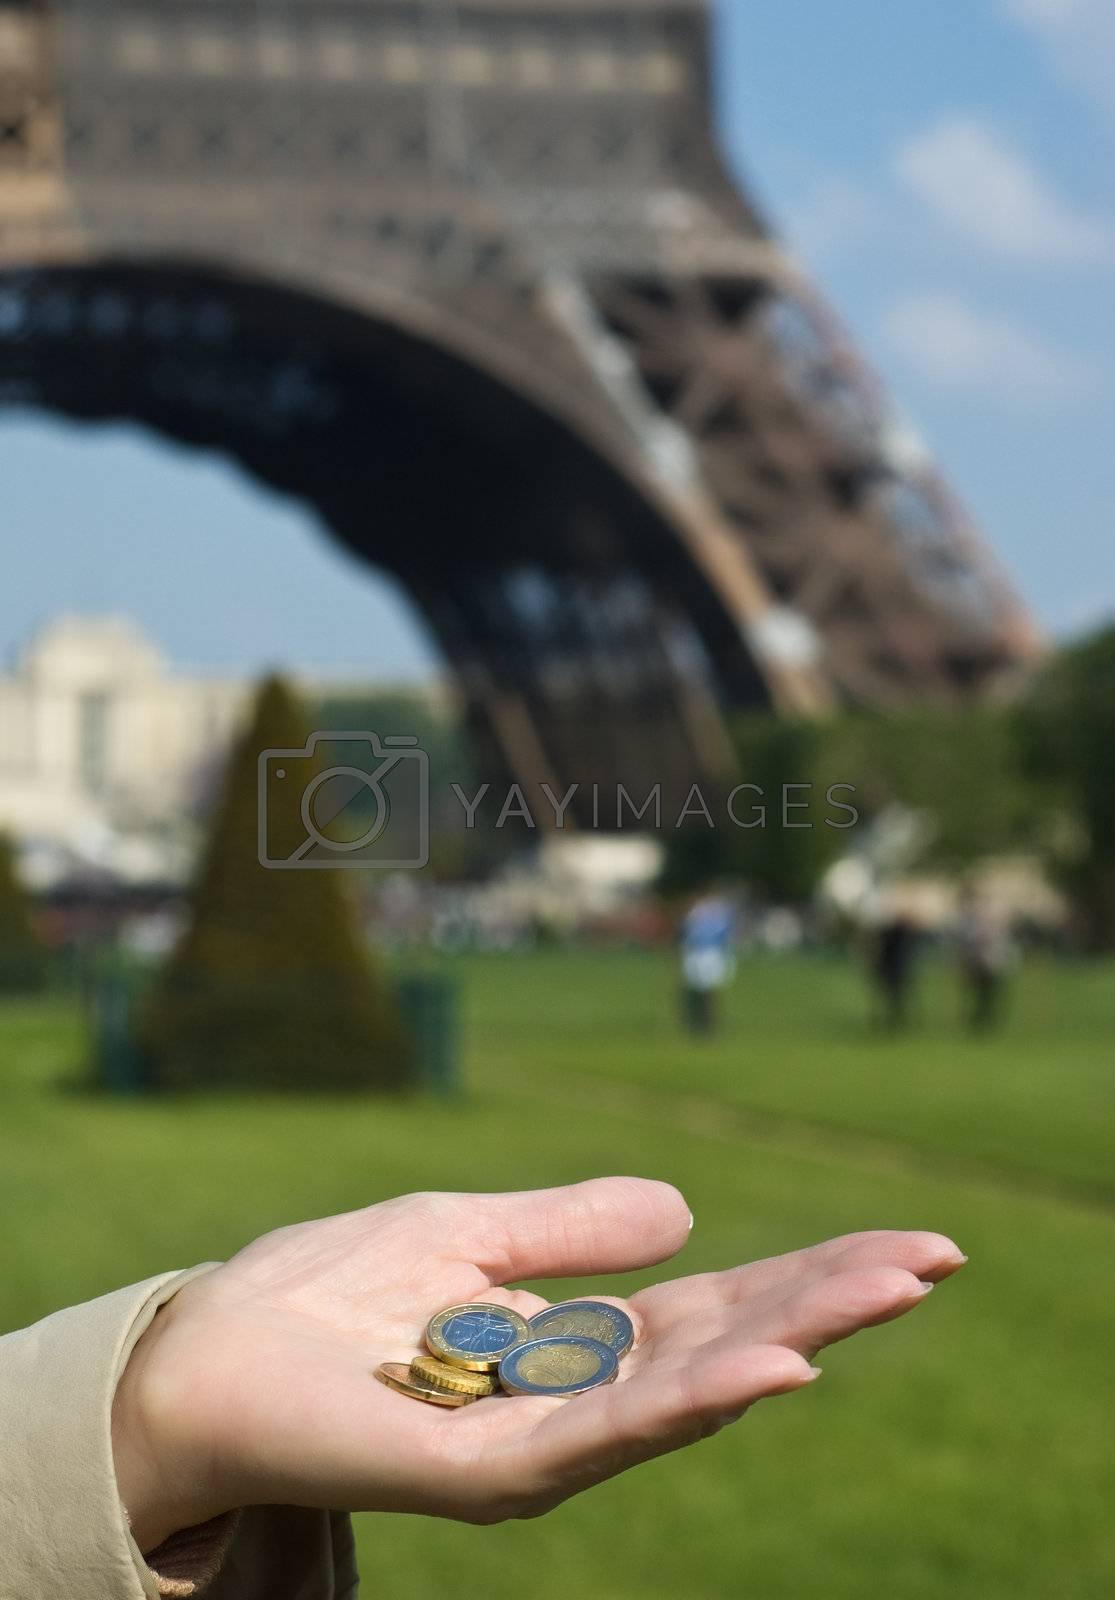 Royalty free image of Euro in Europe by iribo